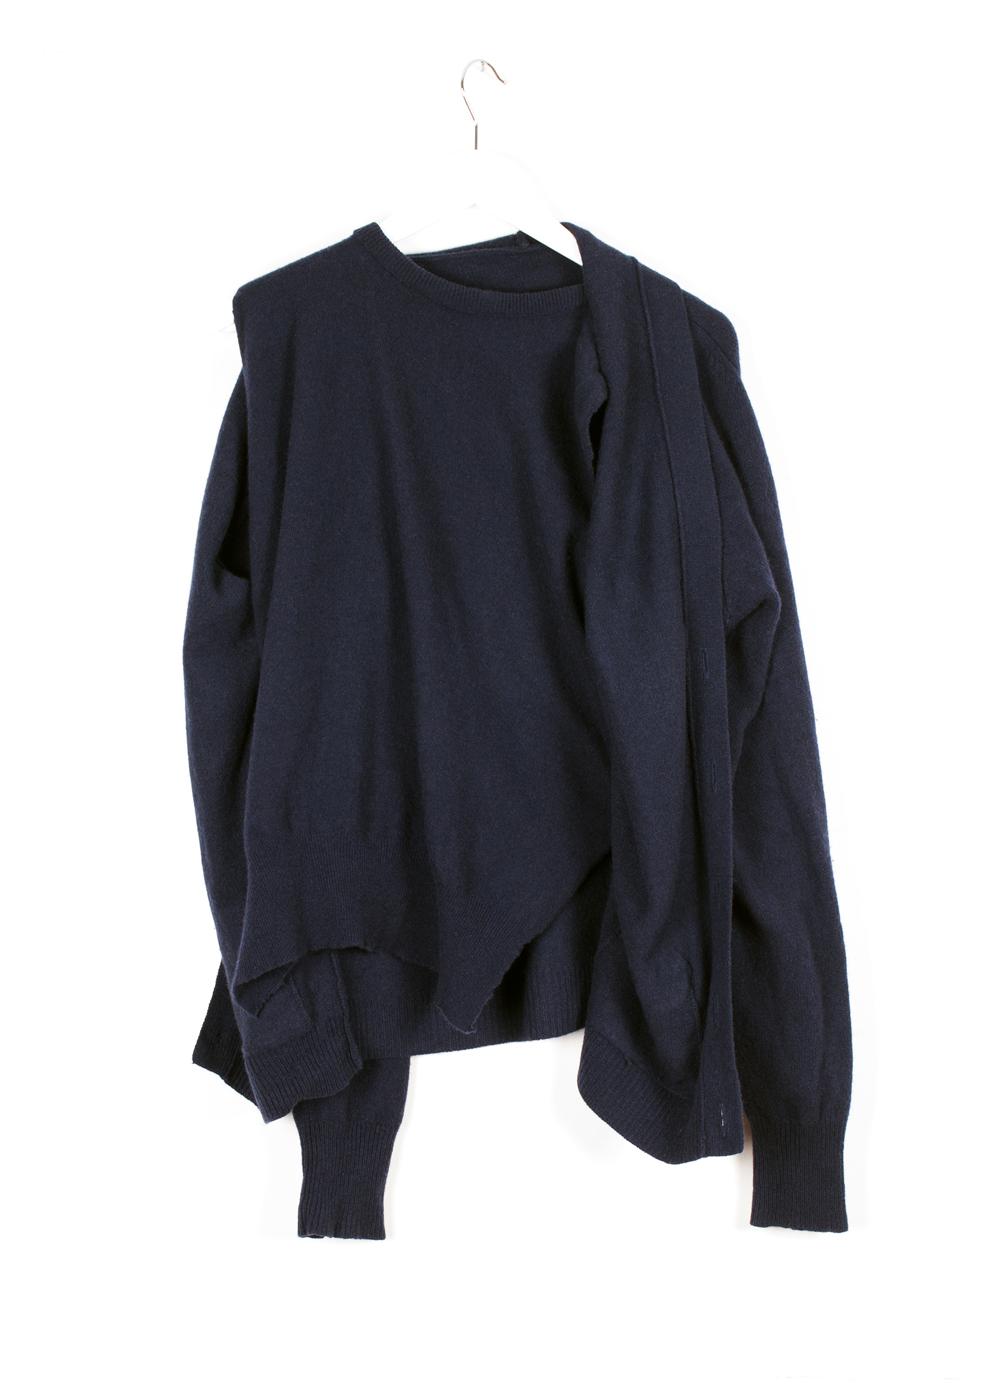 DRESS Reconfigured Knitwear: Navy Inbuilt Twin Set Front 2 #dressltd